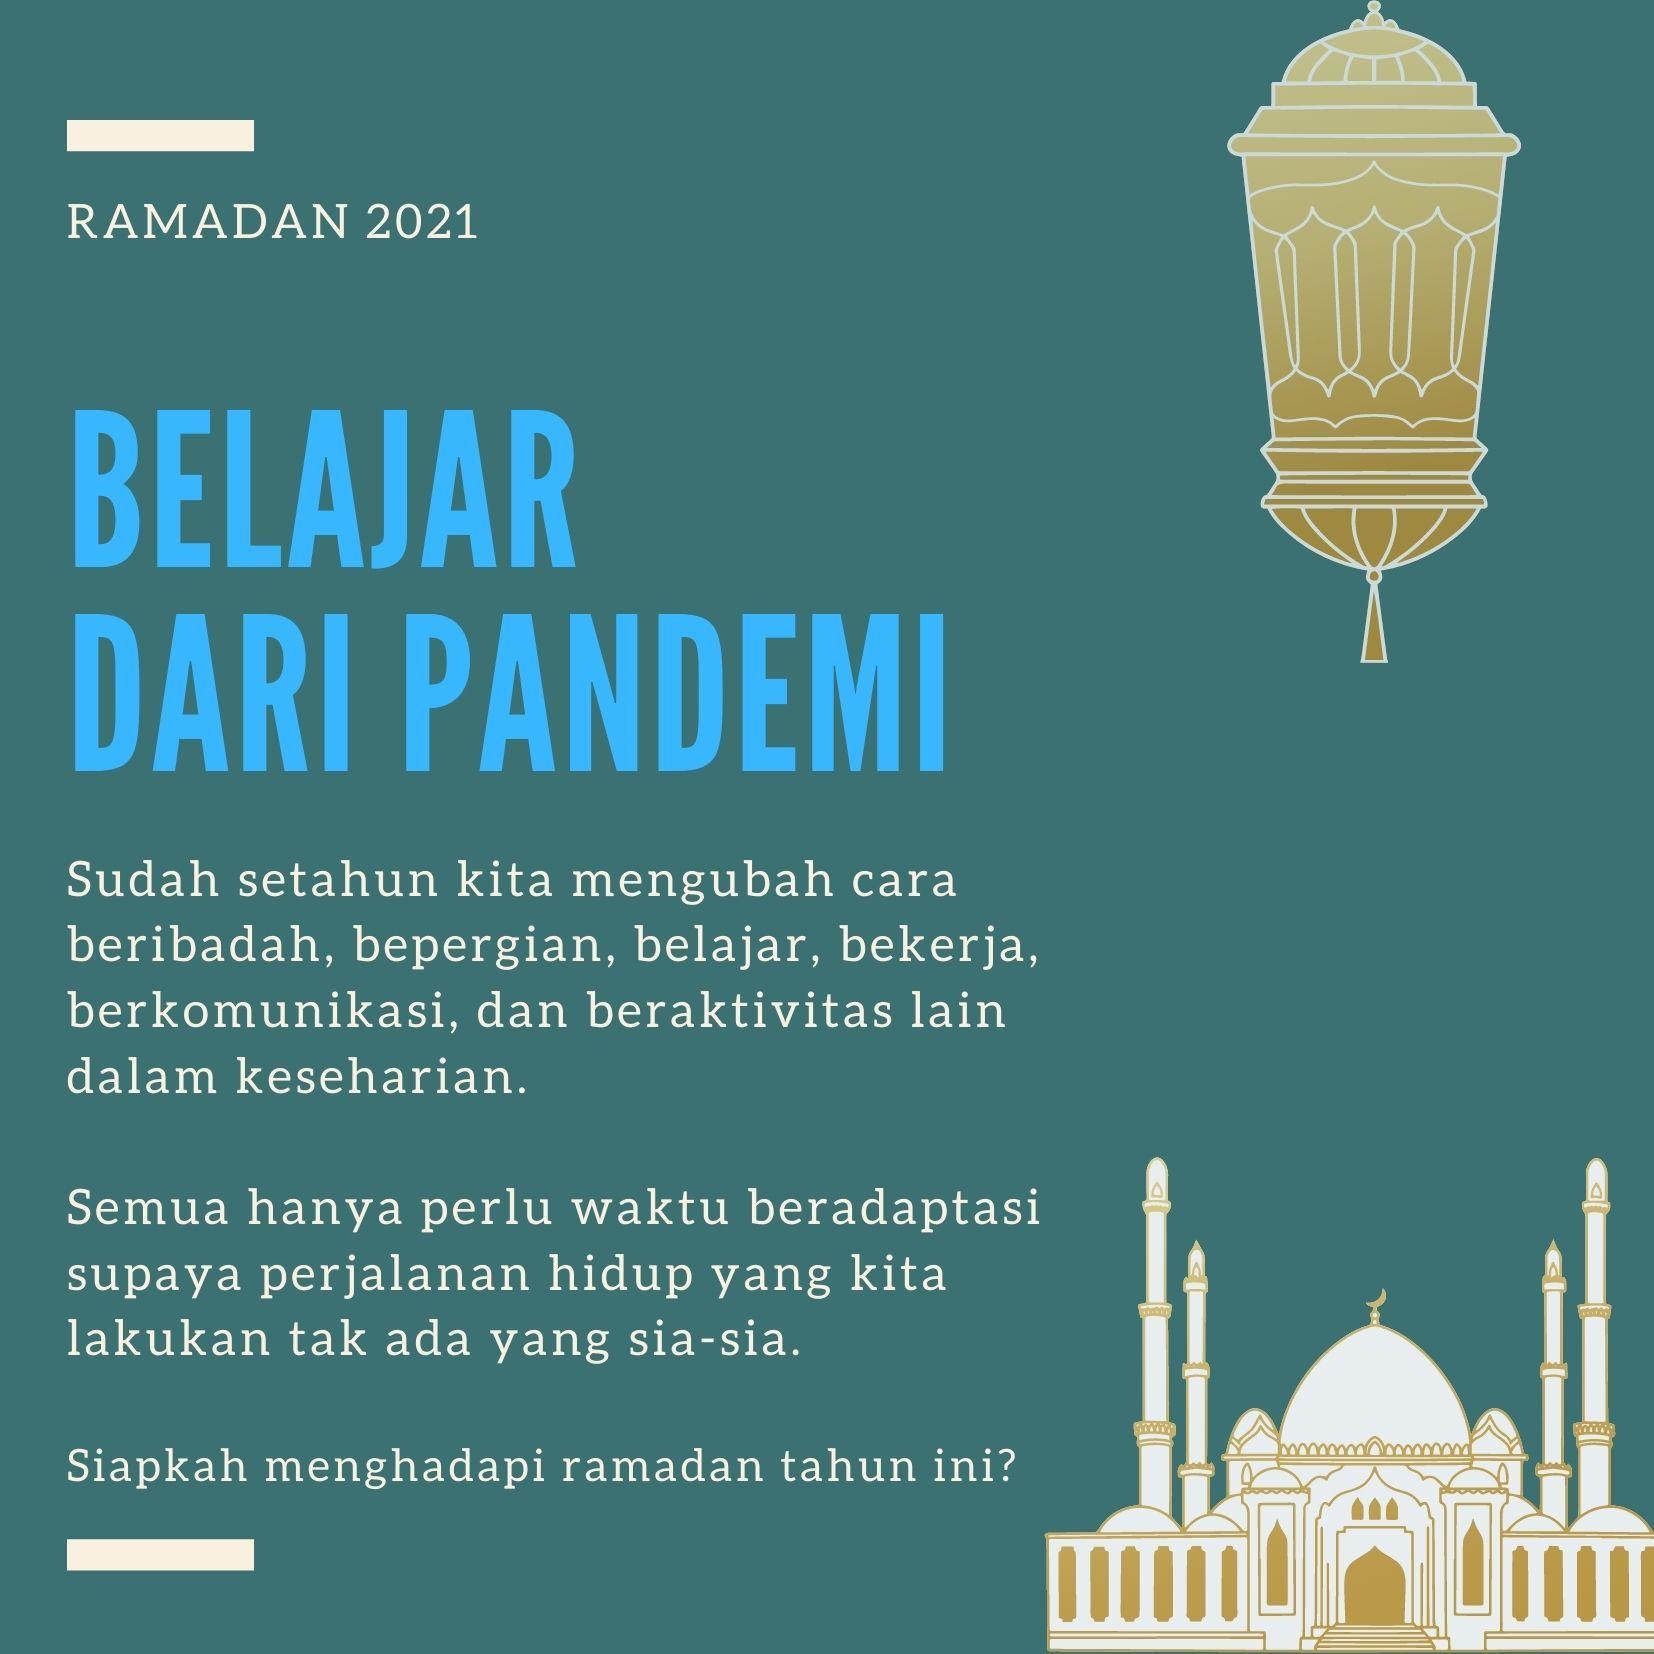 Ramadan 2021, Belajar dari Pandemi